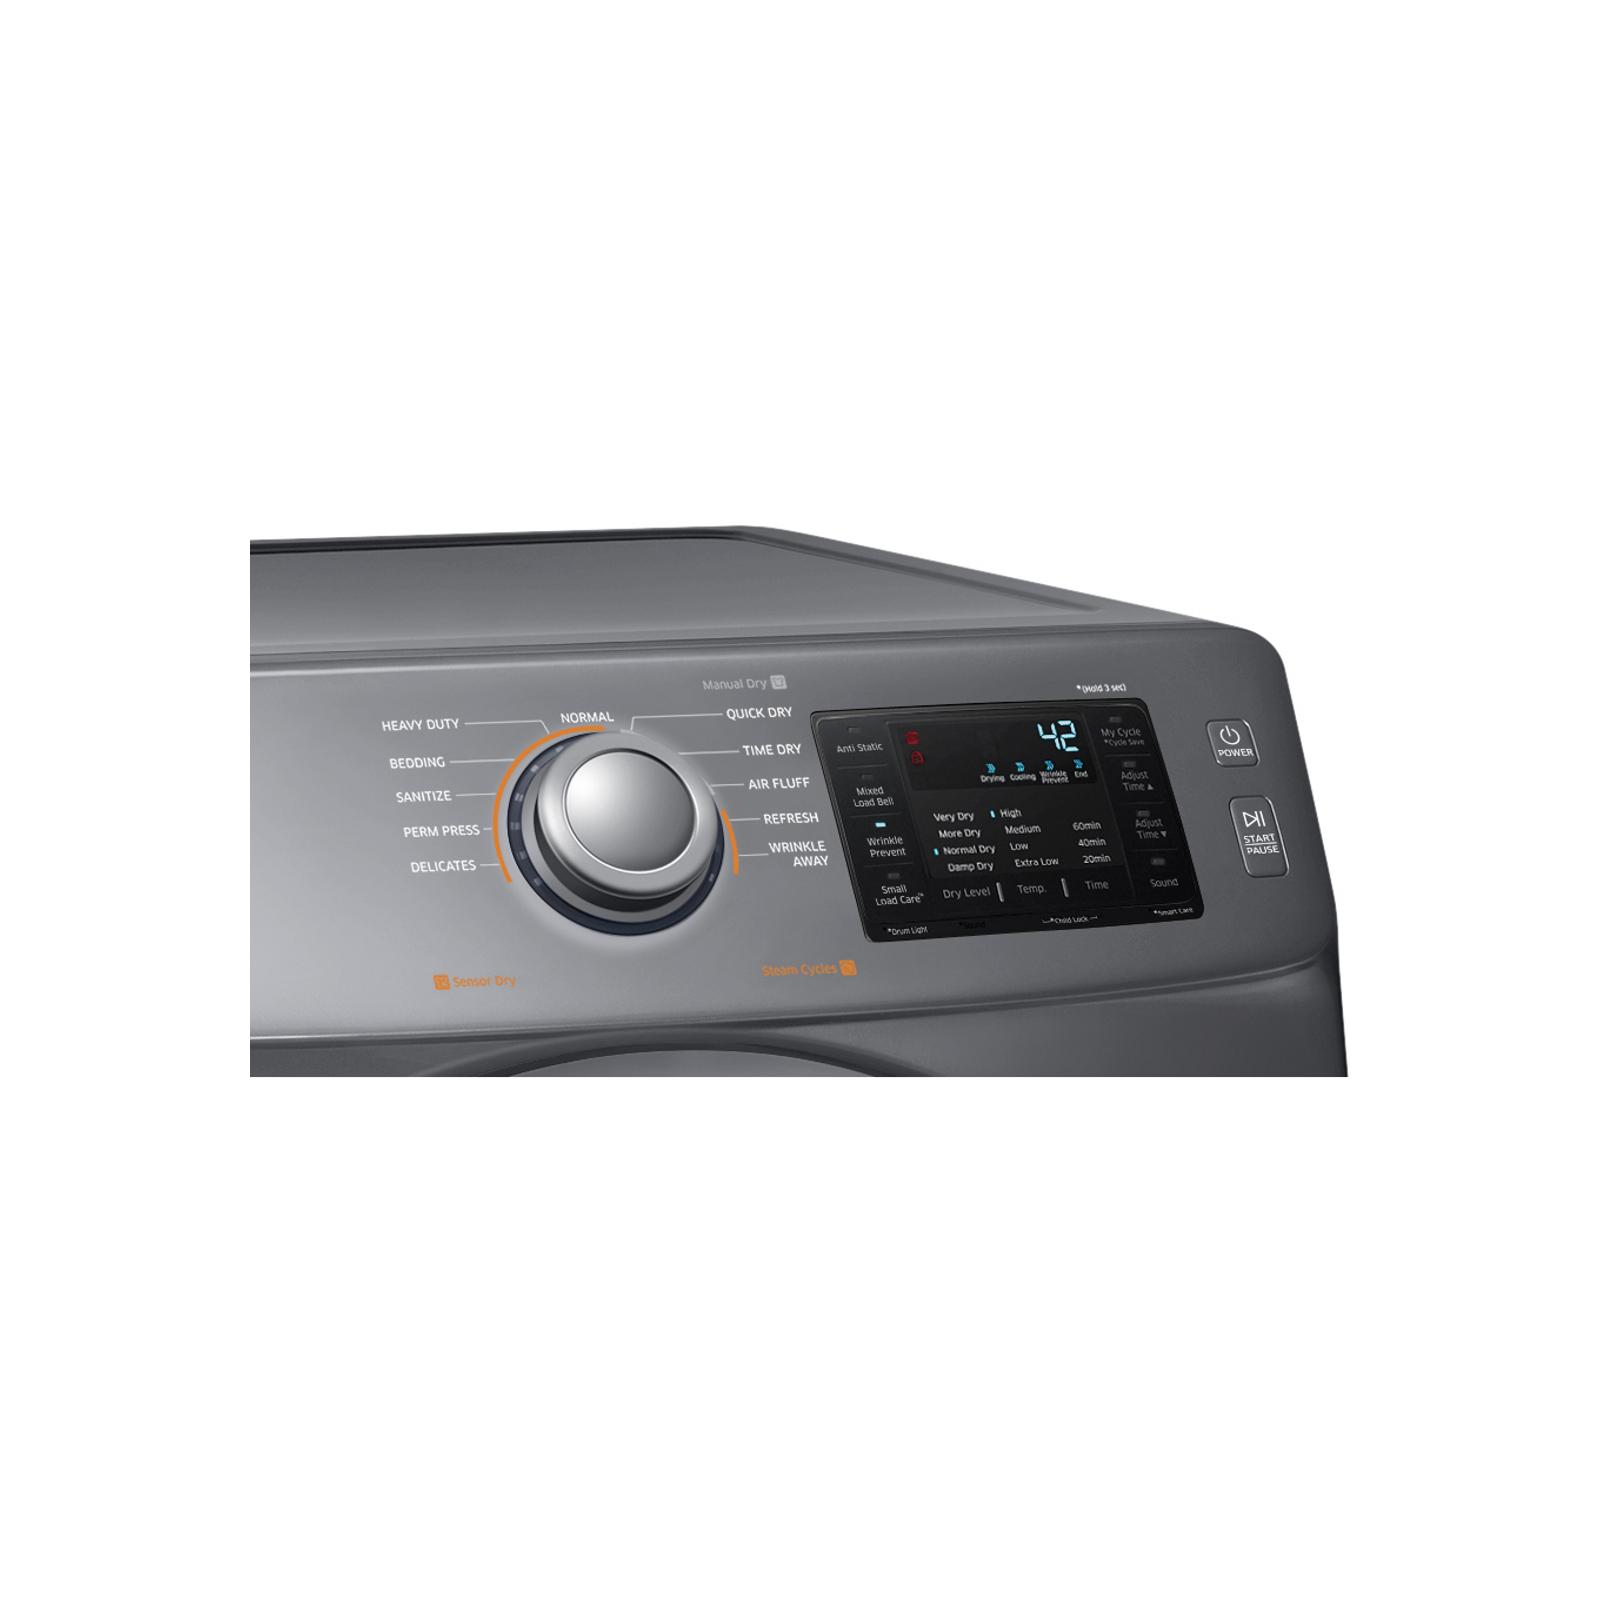 Samsung DV42H5200GP 7.5 cu. ft. Gas Dryer - Stainless Platinum